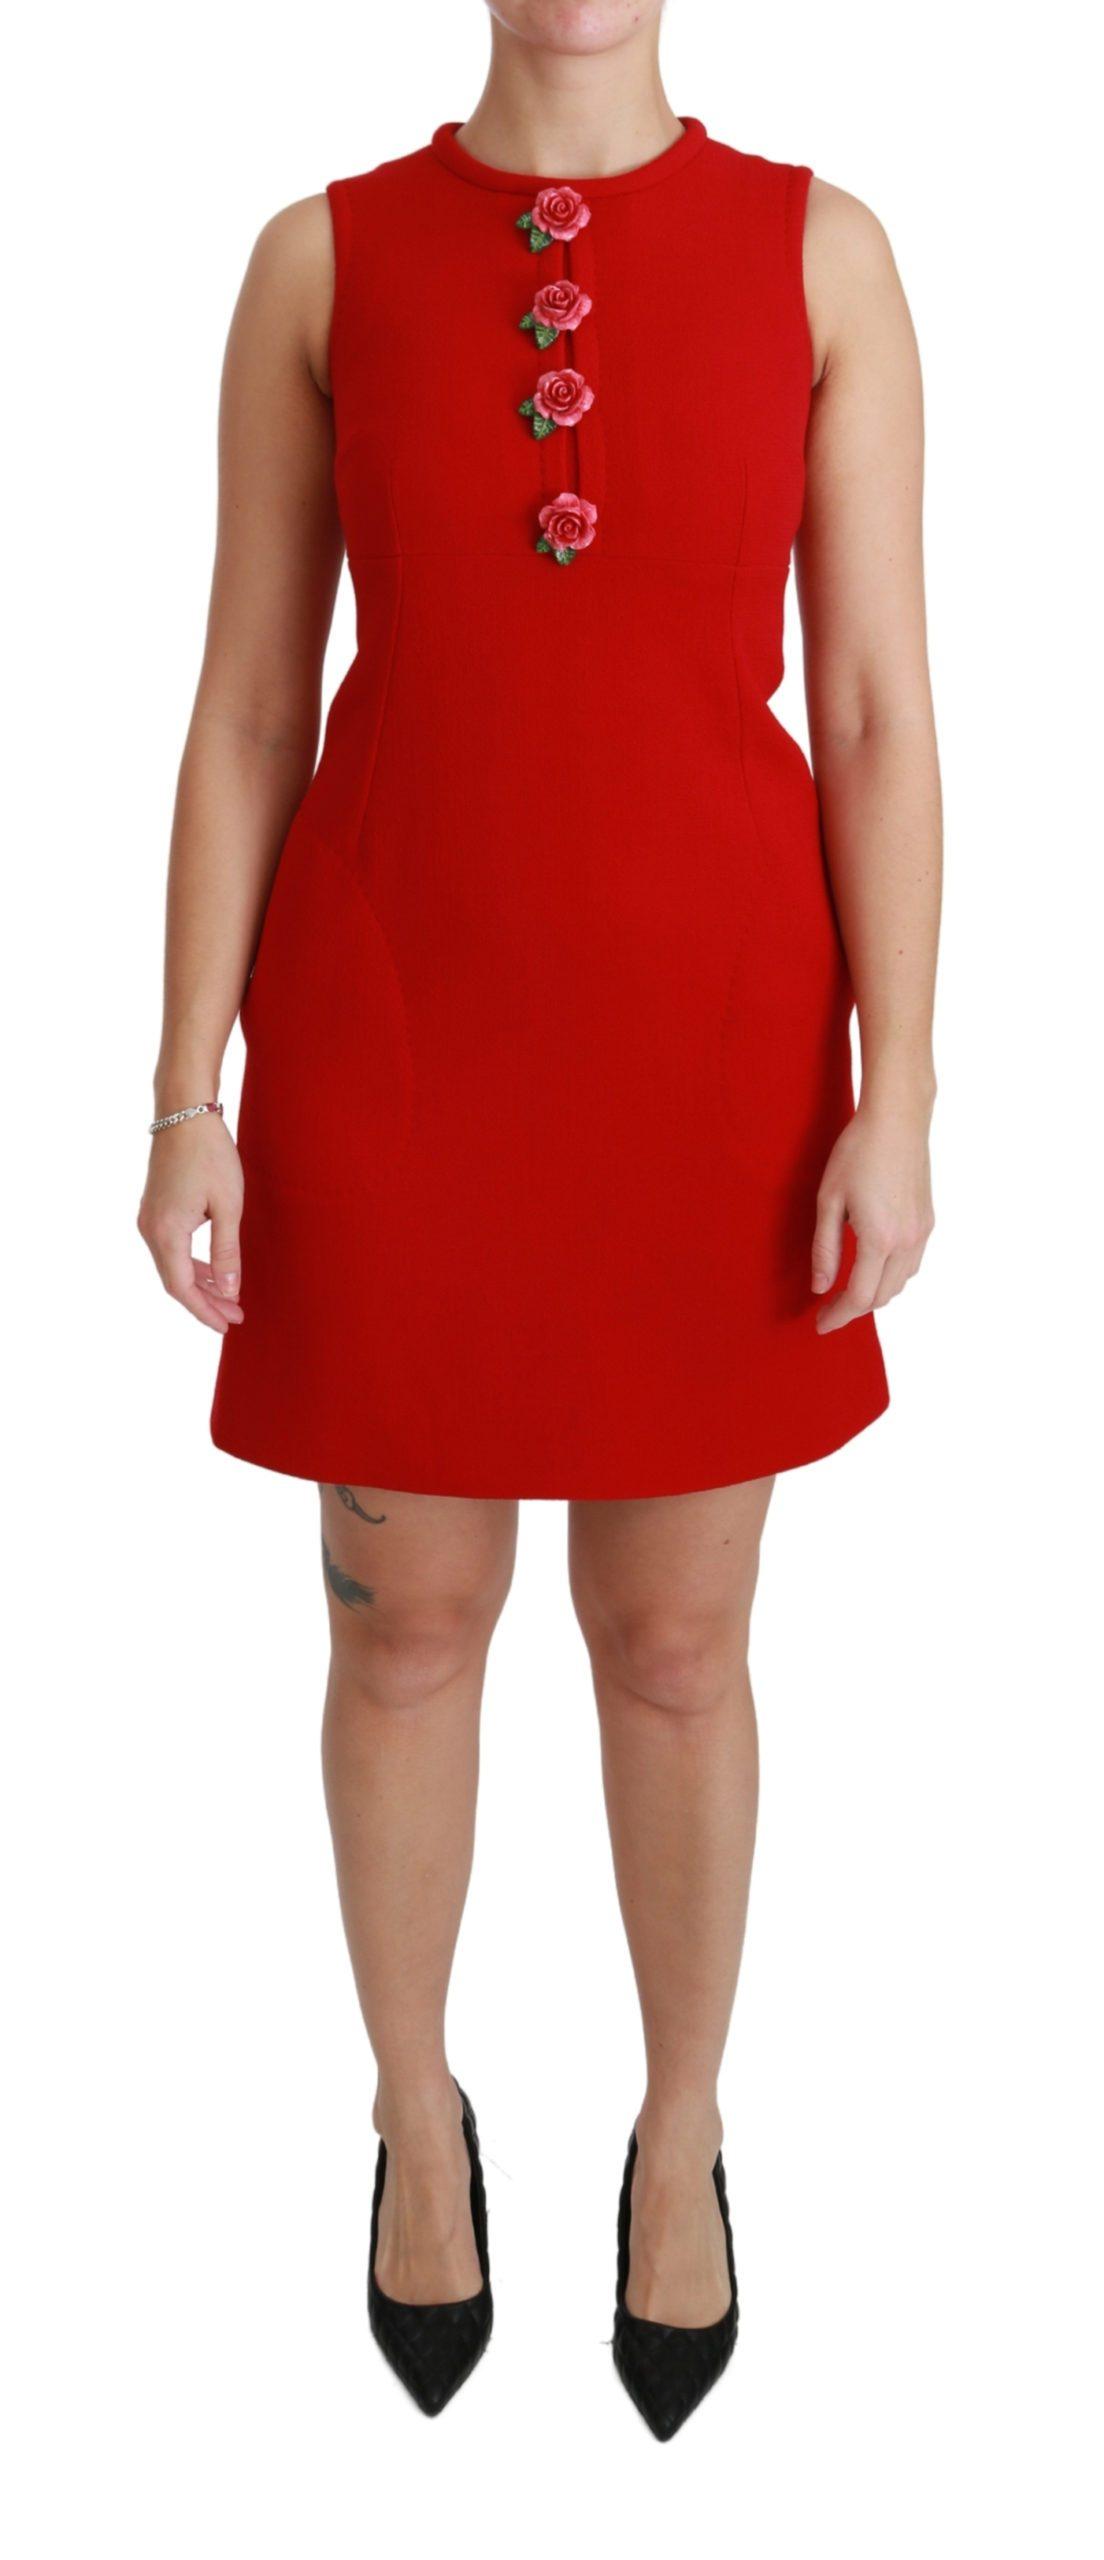 Dolce & Gabbana Women's Wool Roses Shift Mini Gown Dress Red DR2466 - IT46 XL